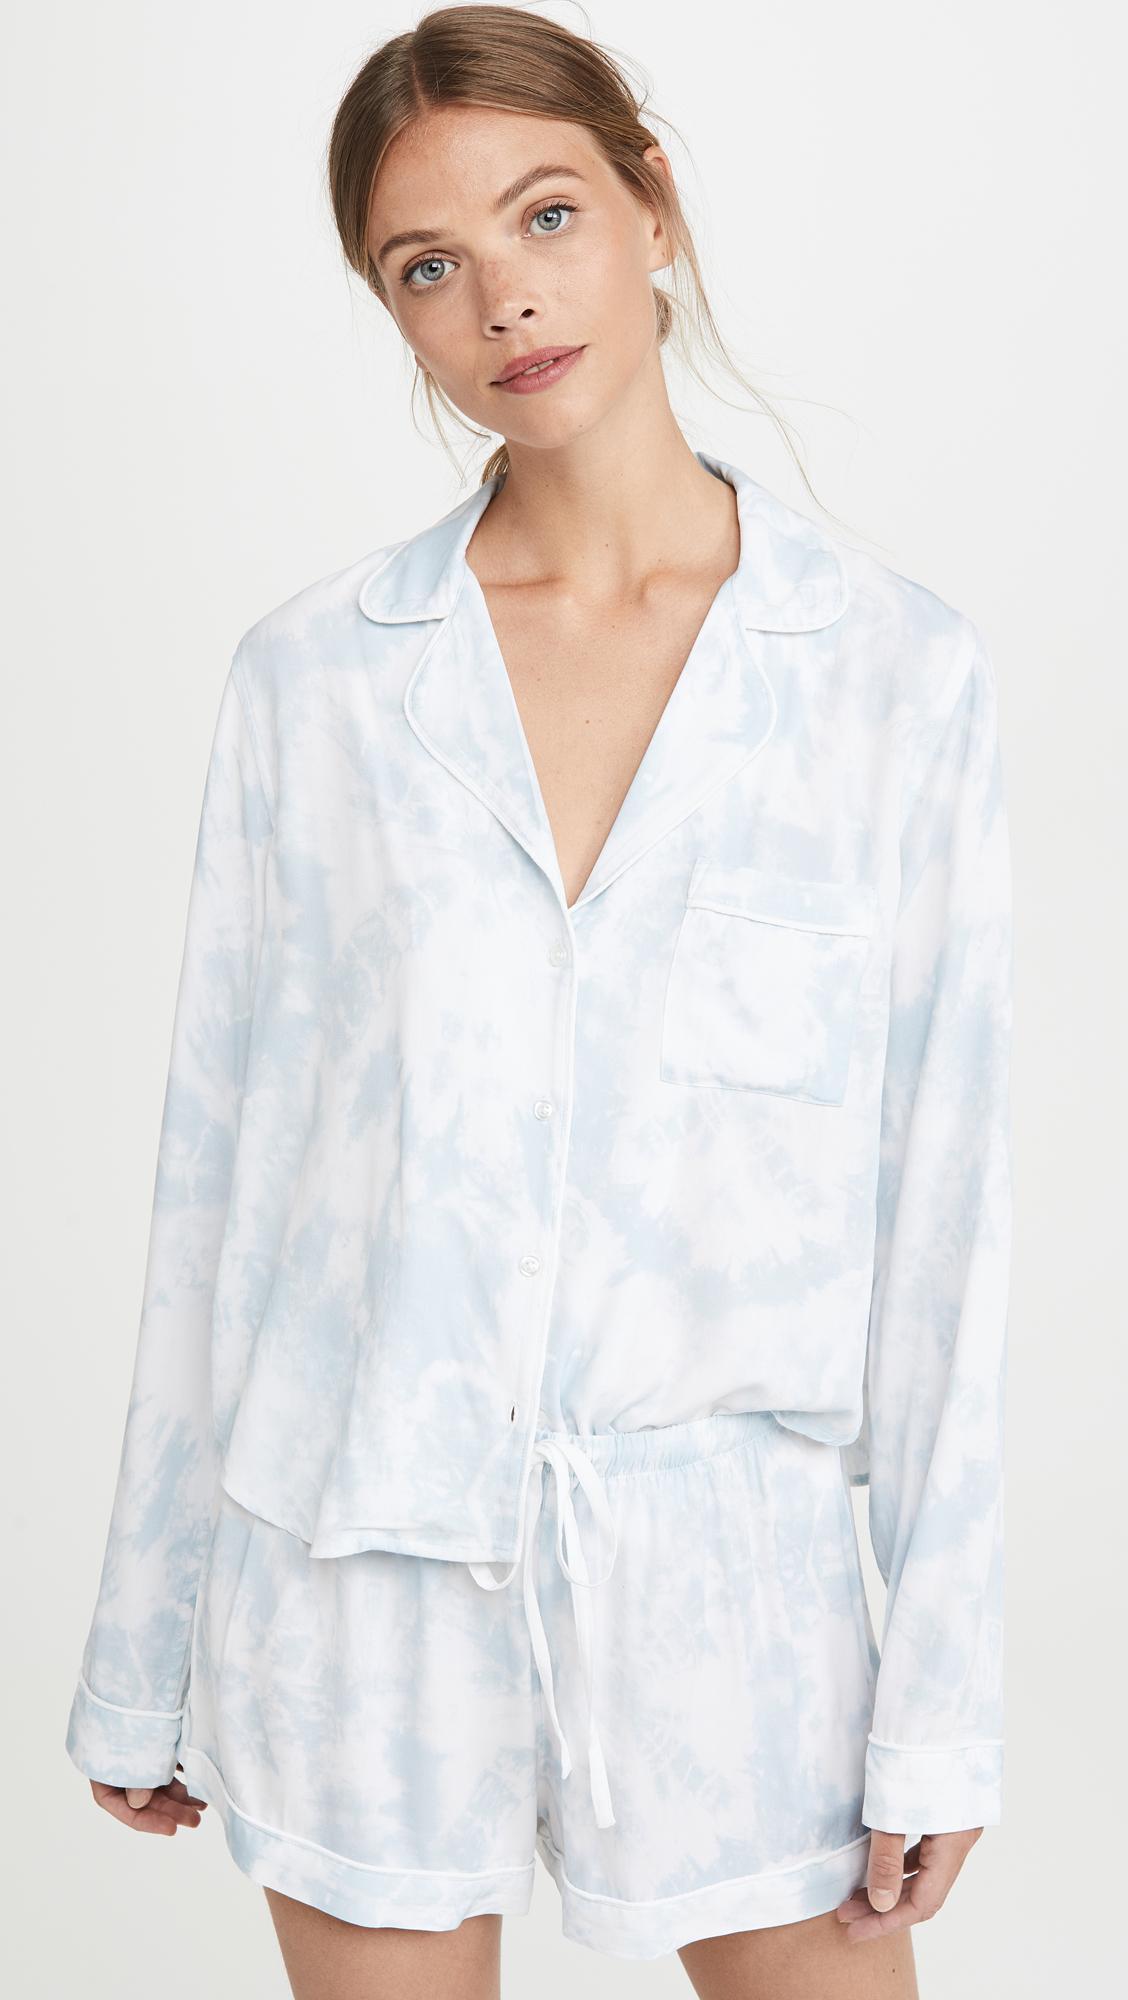 Nina Dobrev's Tie-Dye Matching Set Is Absolutely My Next Purchase 7